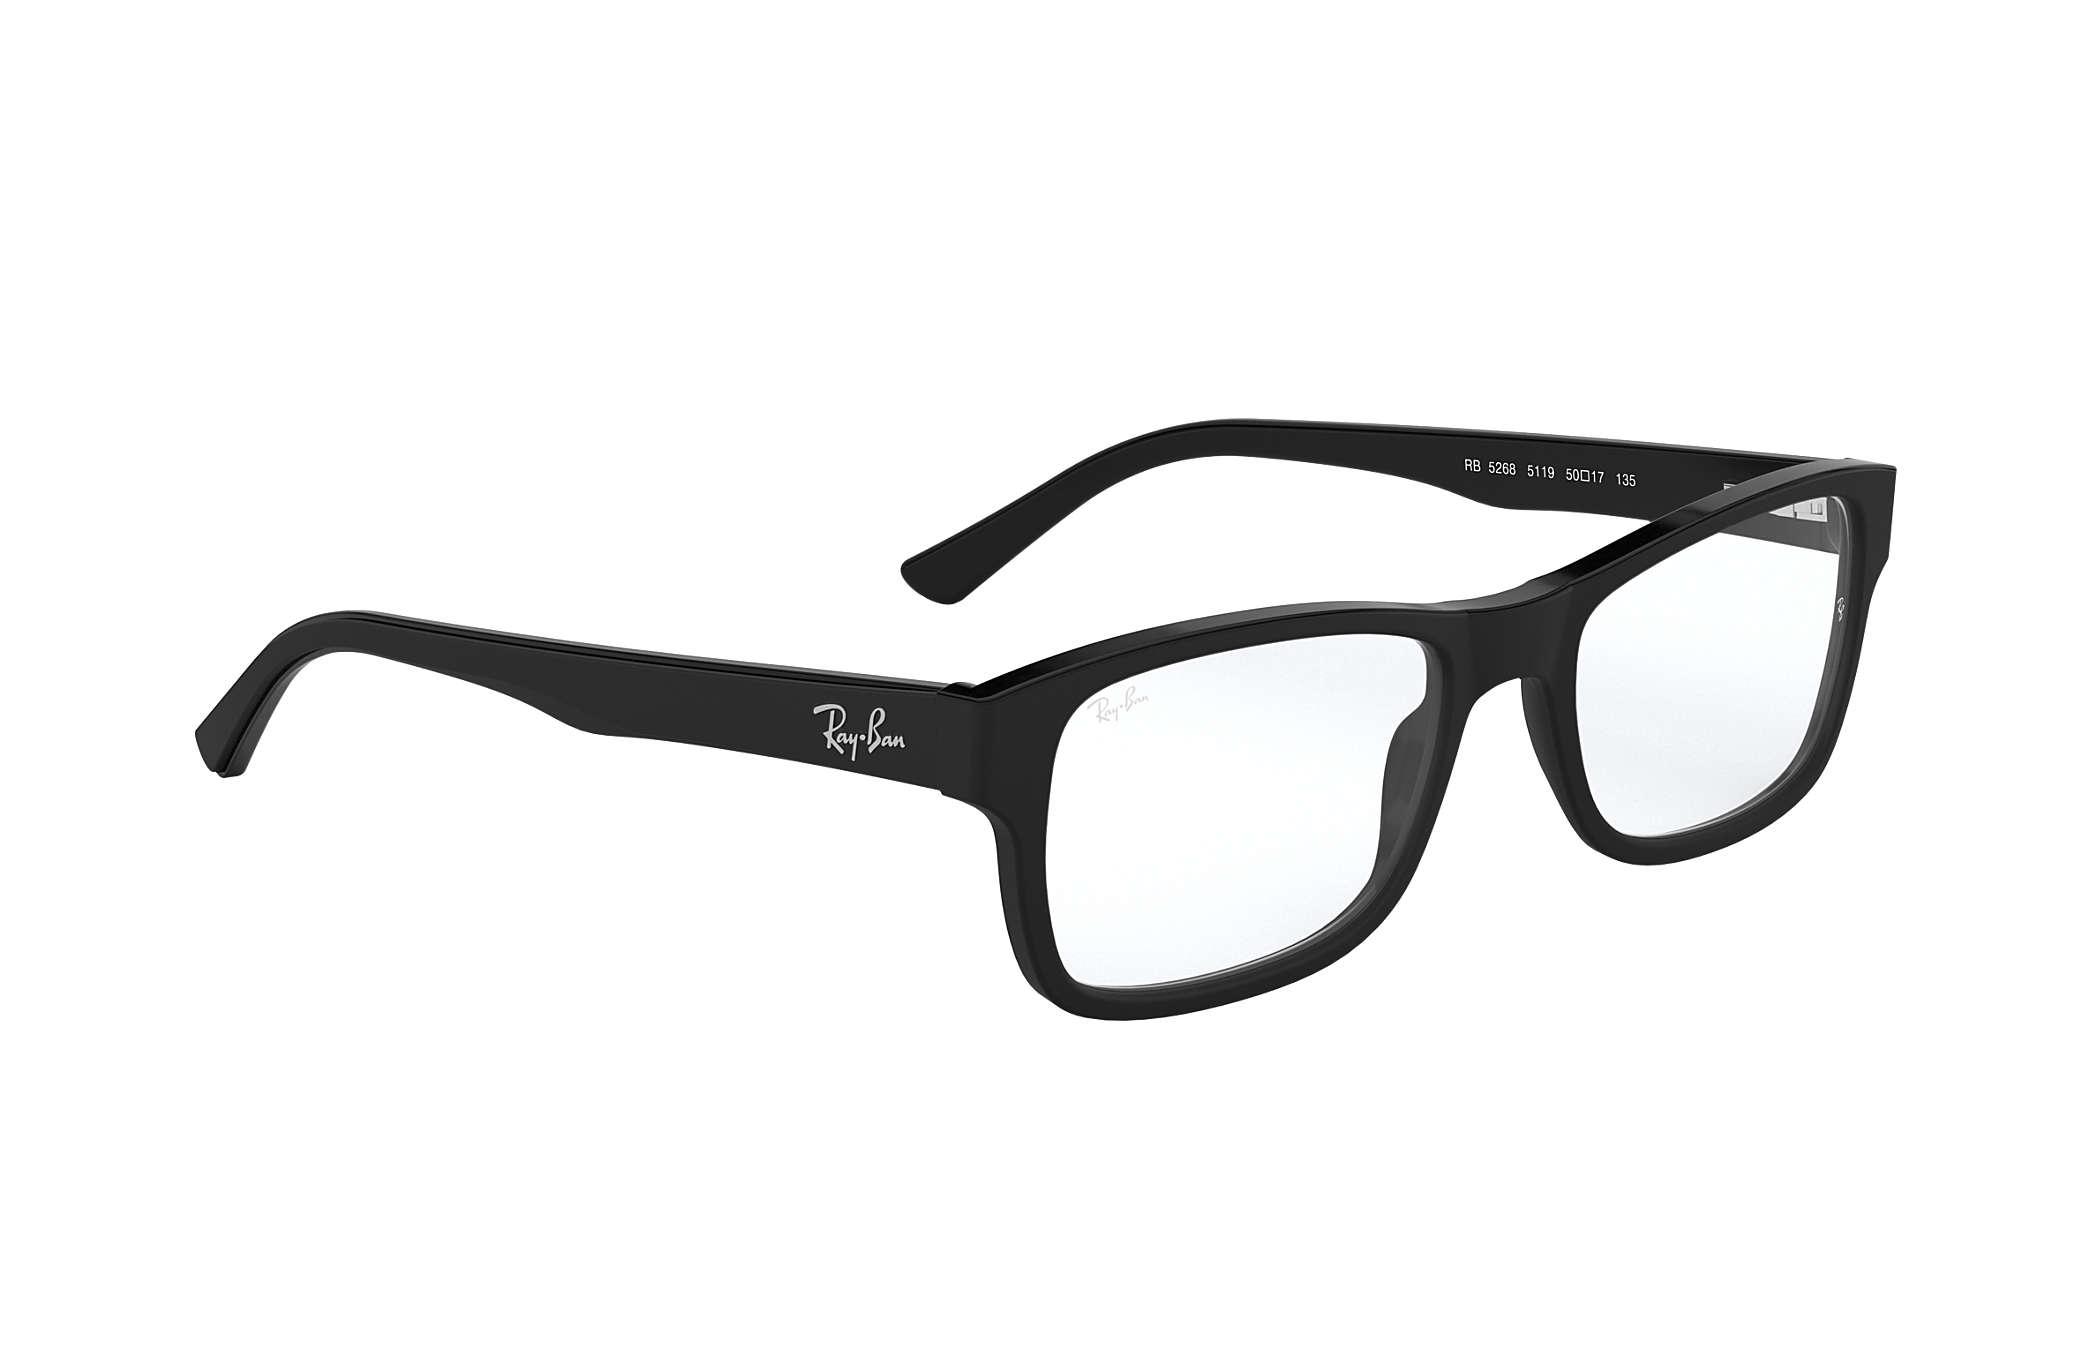 118c92ada7 Gafas de vista Ray-Ban RB5268 Negro - Acetato - 0RX5268511950 | Ray ...